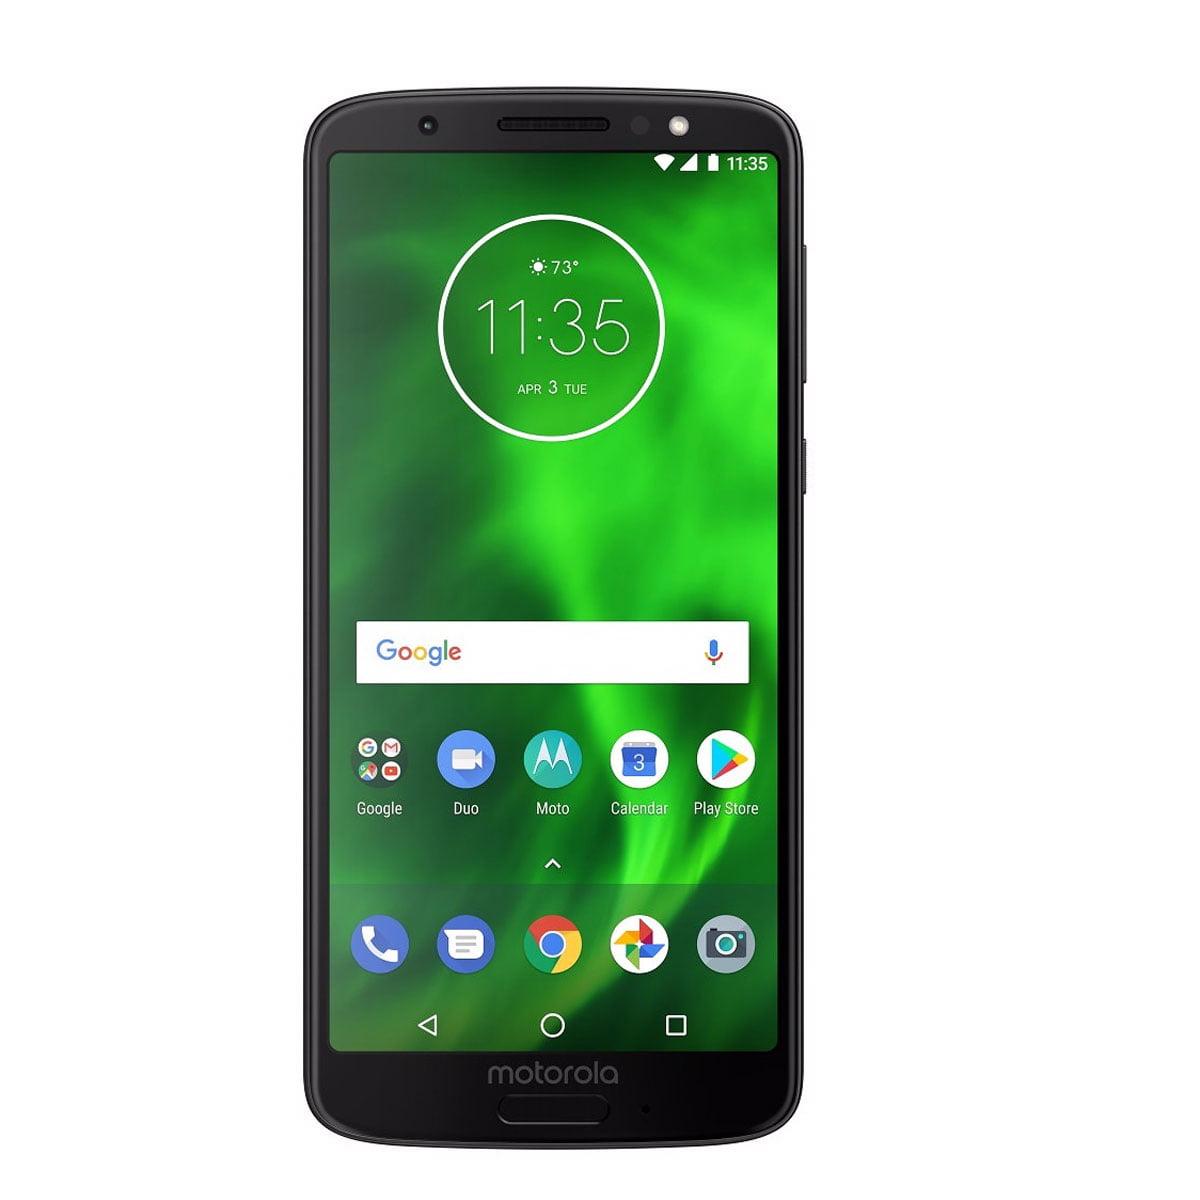 "New Motorola Moto G6 32GB XT1925-2 Dual SIM Factory Unlocked 4G LTE 5.7"" IPS LCD Smartphone Dual 12MP + 5MP Smartphone - Deep Indigo - International Version"